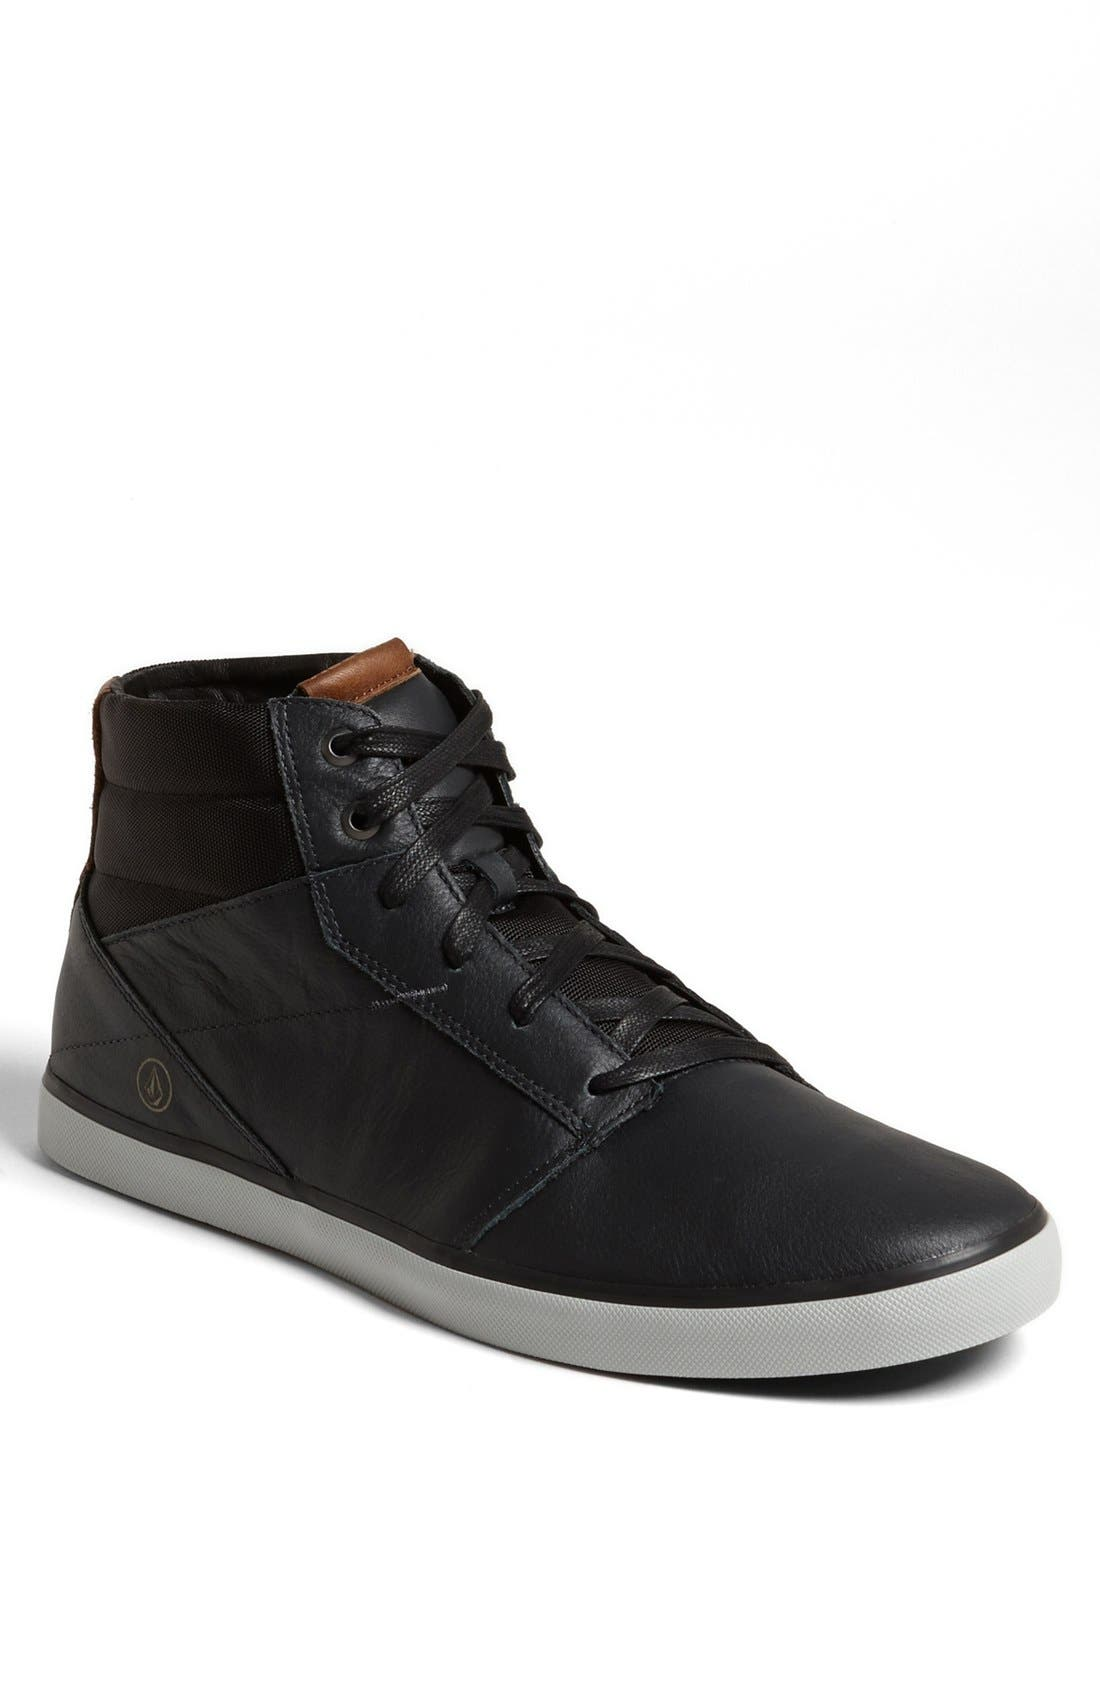 Main Image - Volcom 'Grimm' High Top Sneaker